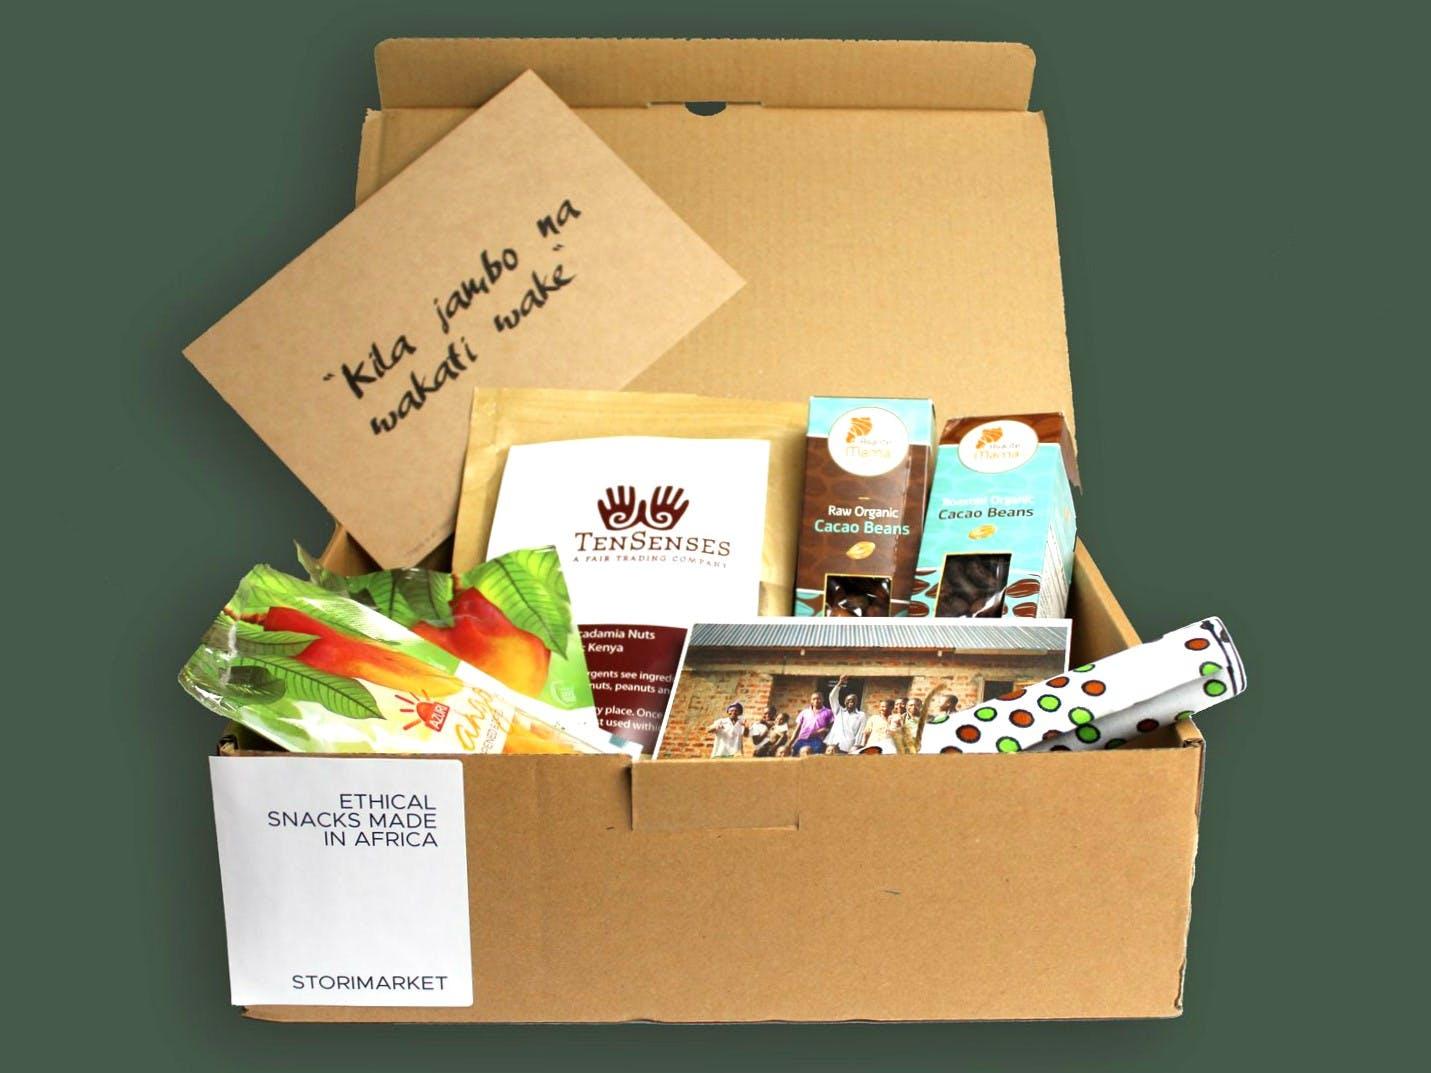 Storimarket Ethical Snack Box